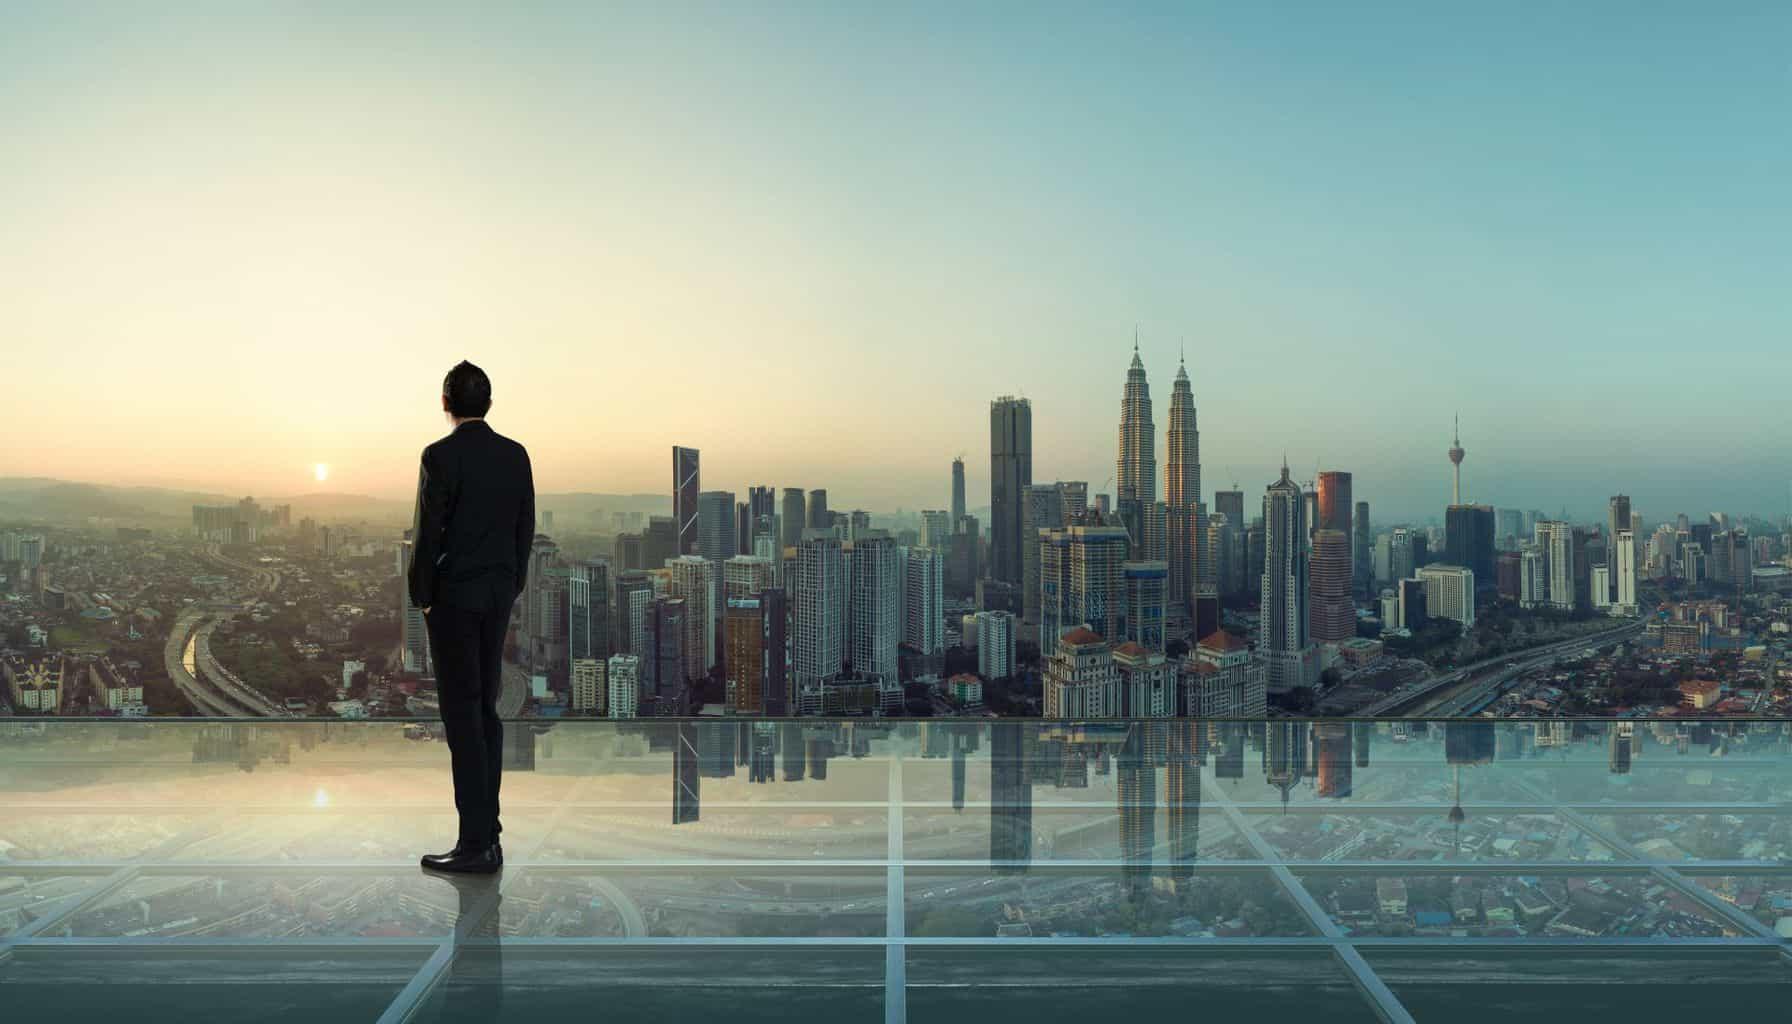 e.GO Mobile: Visionen, Expansionspläne und Millionen-Investment